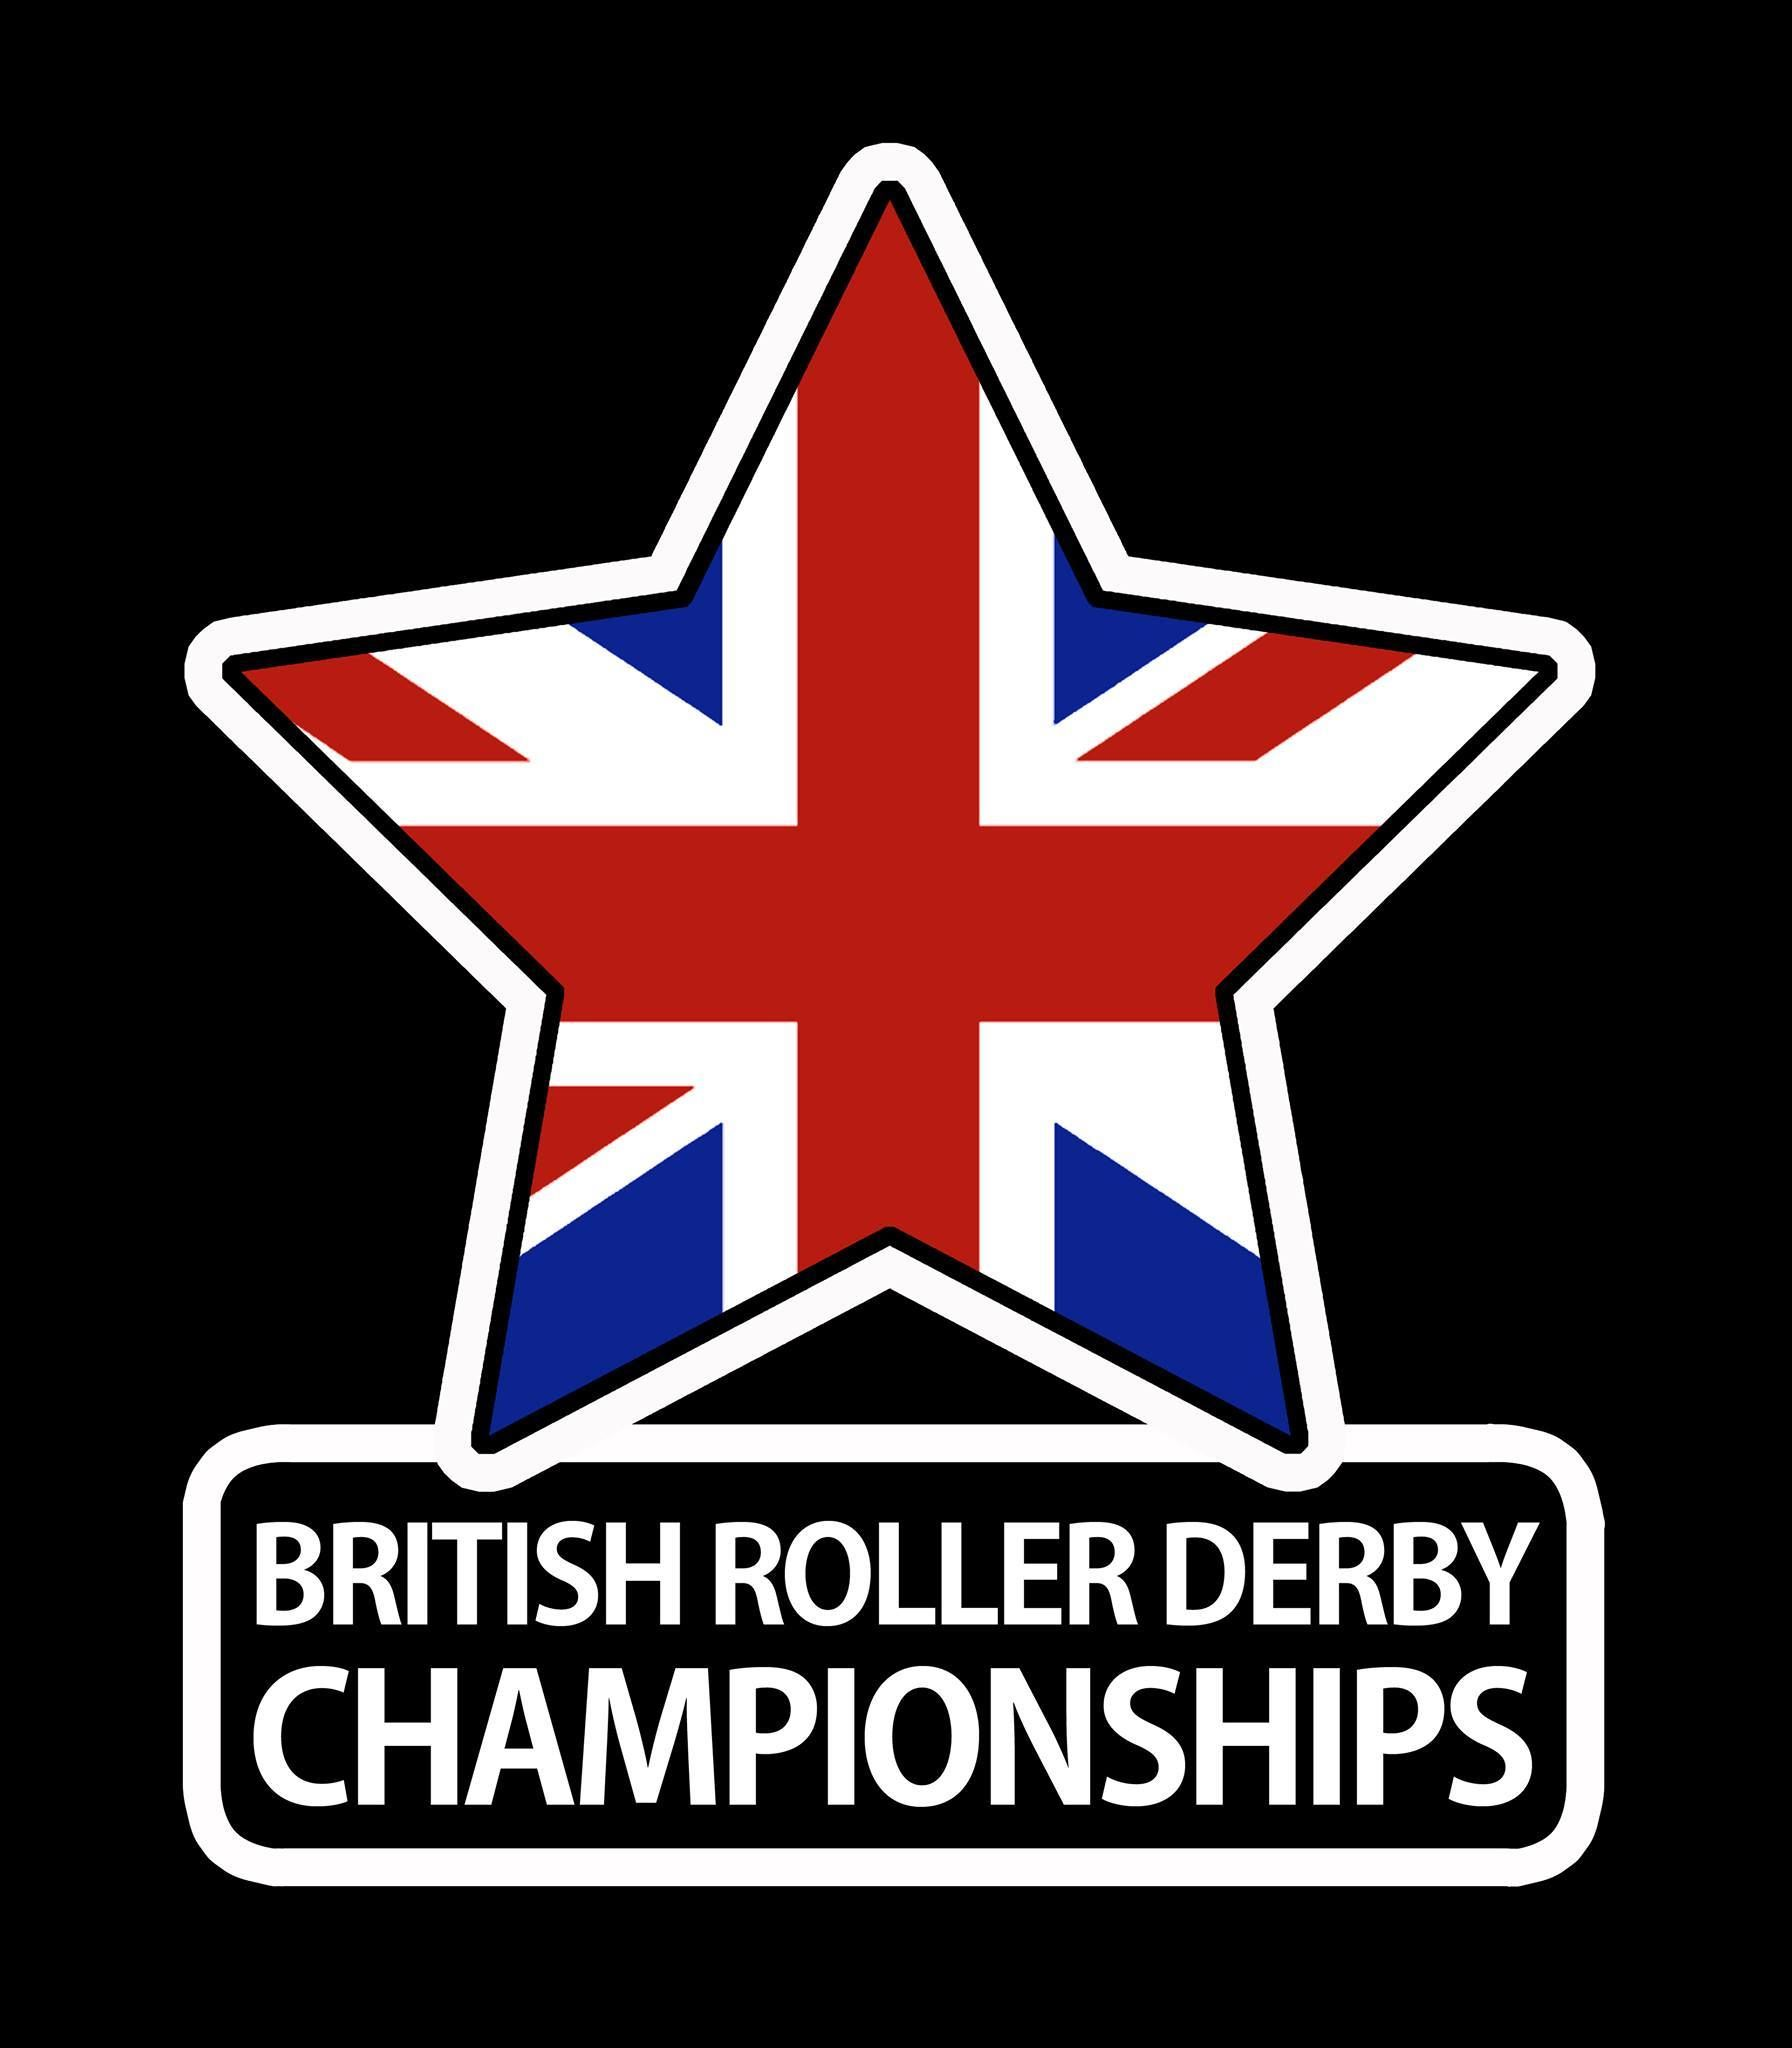 British Roller Derby Championships Roller derby, Roller